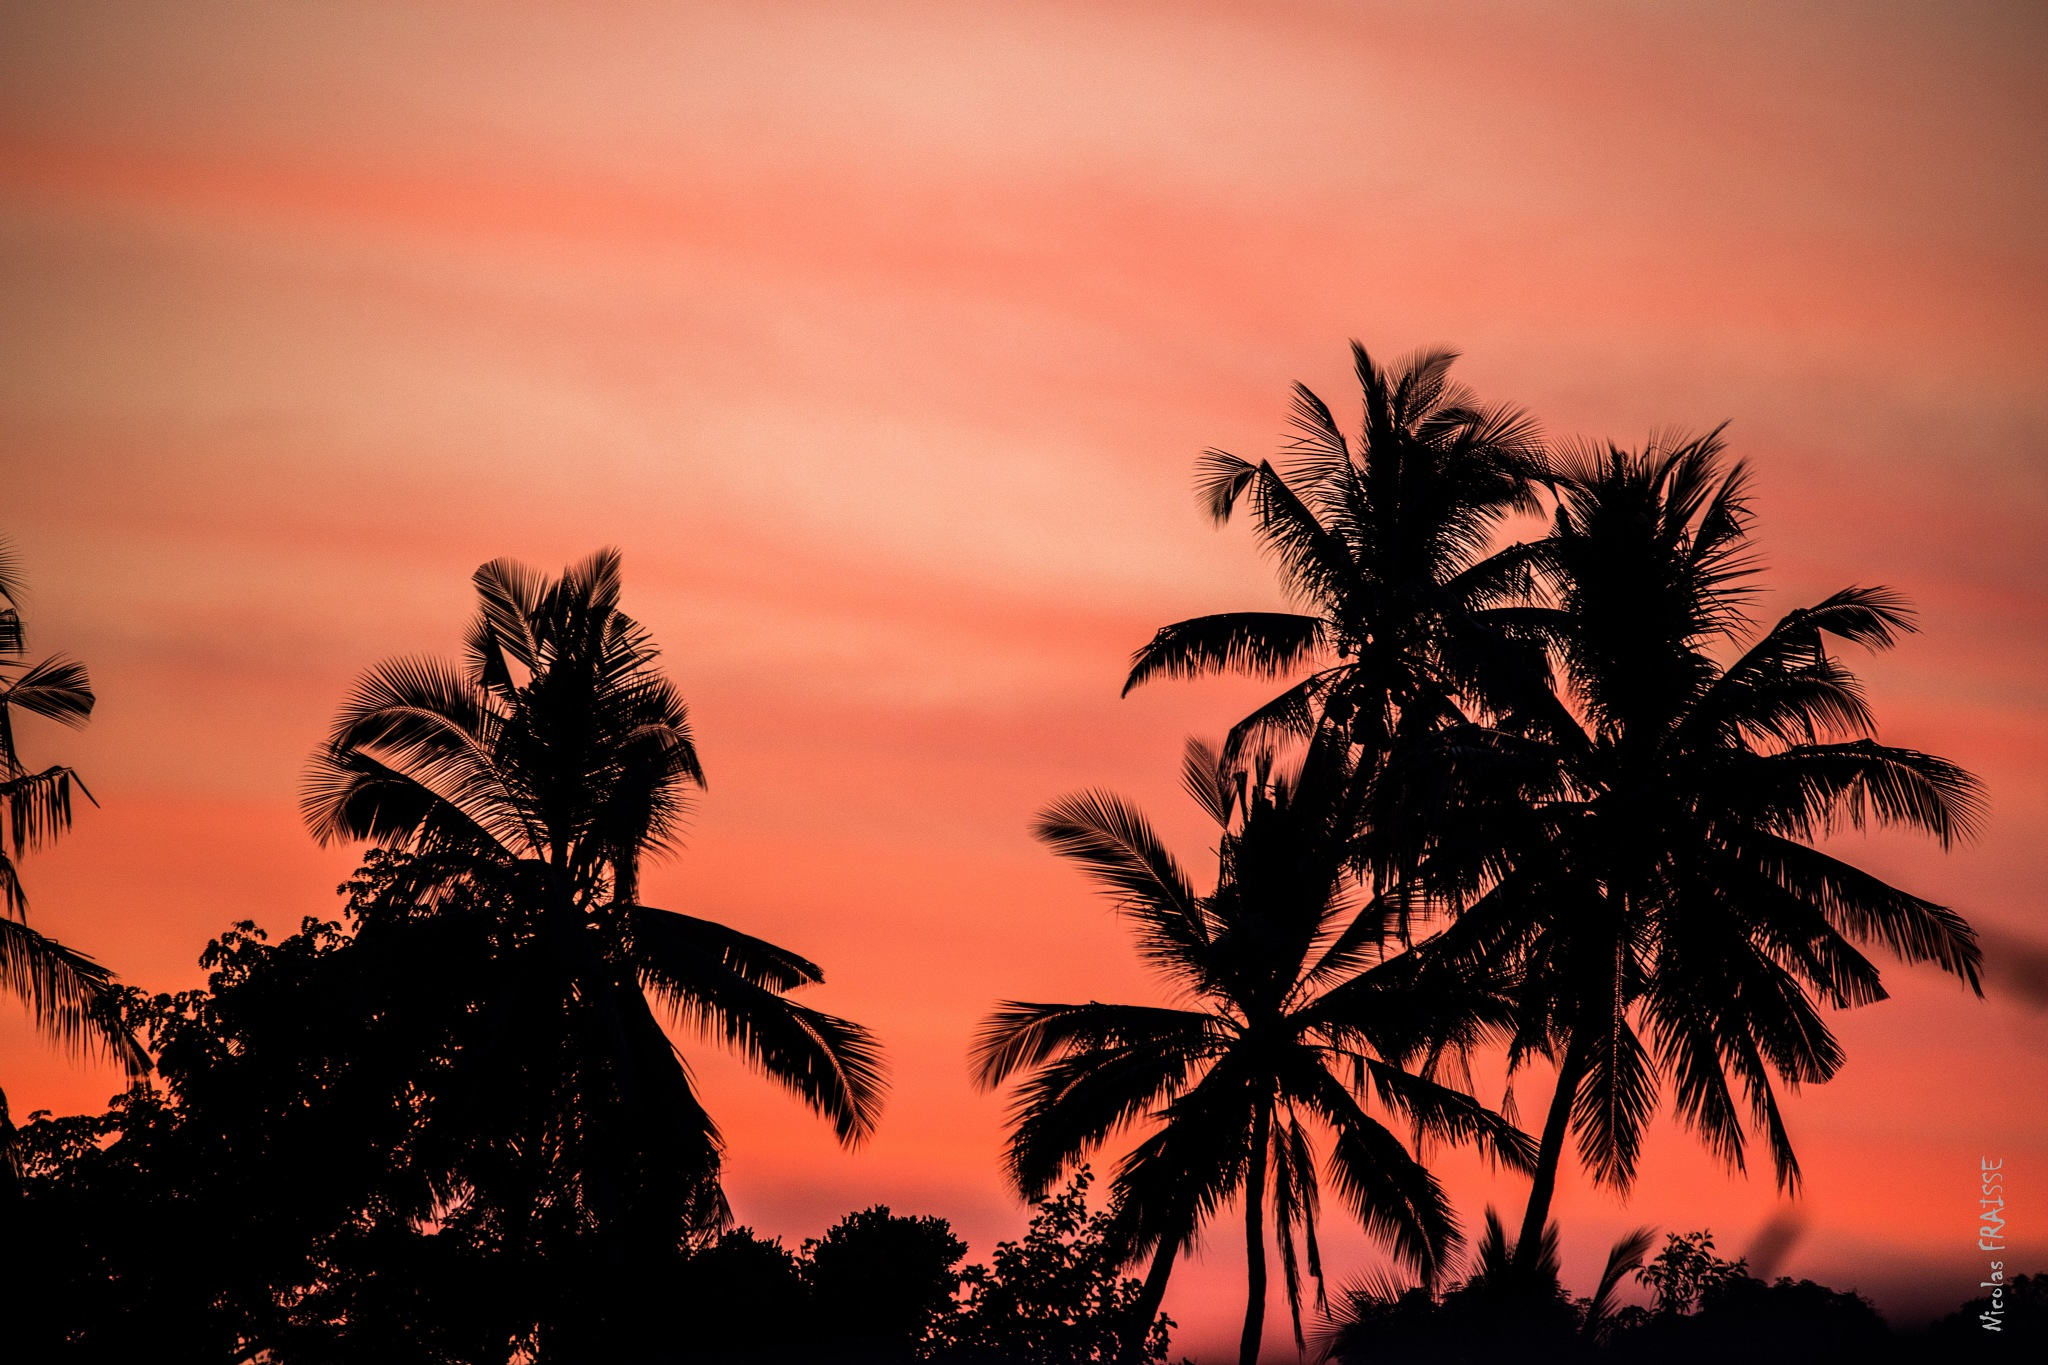 Fire sunset by Nicolas F.